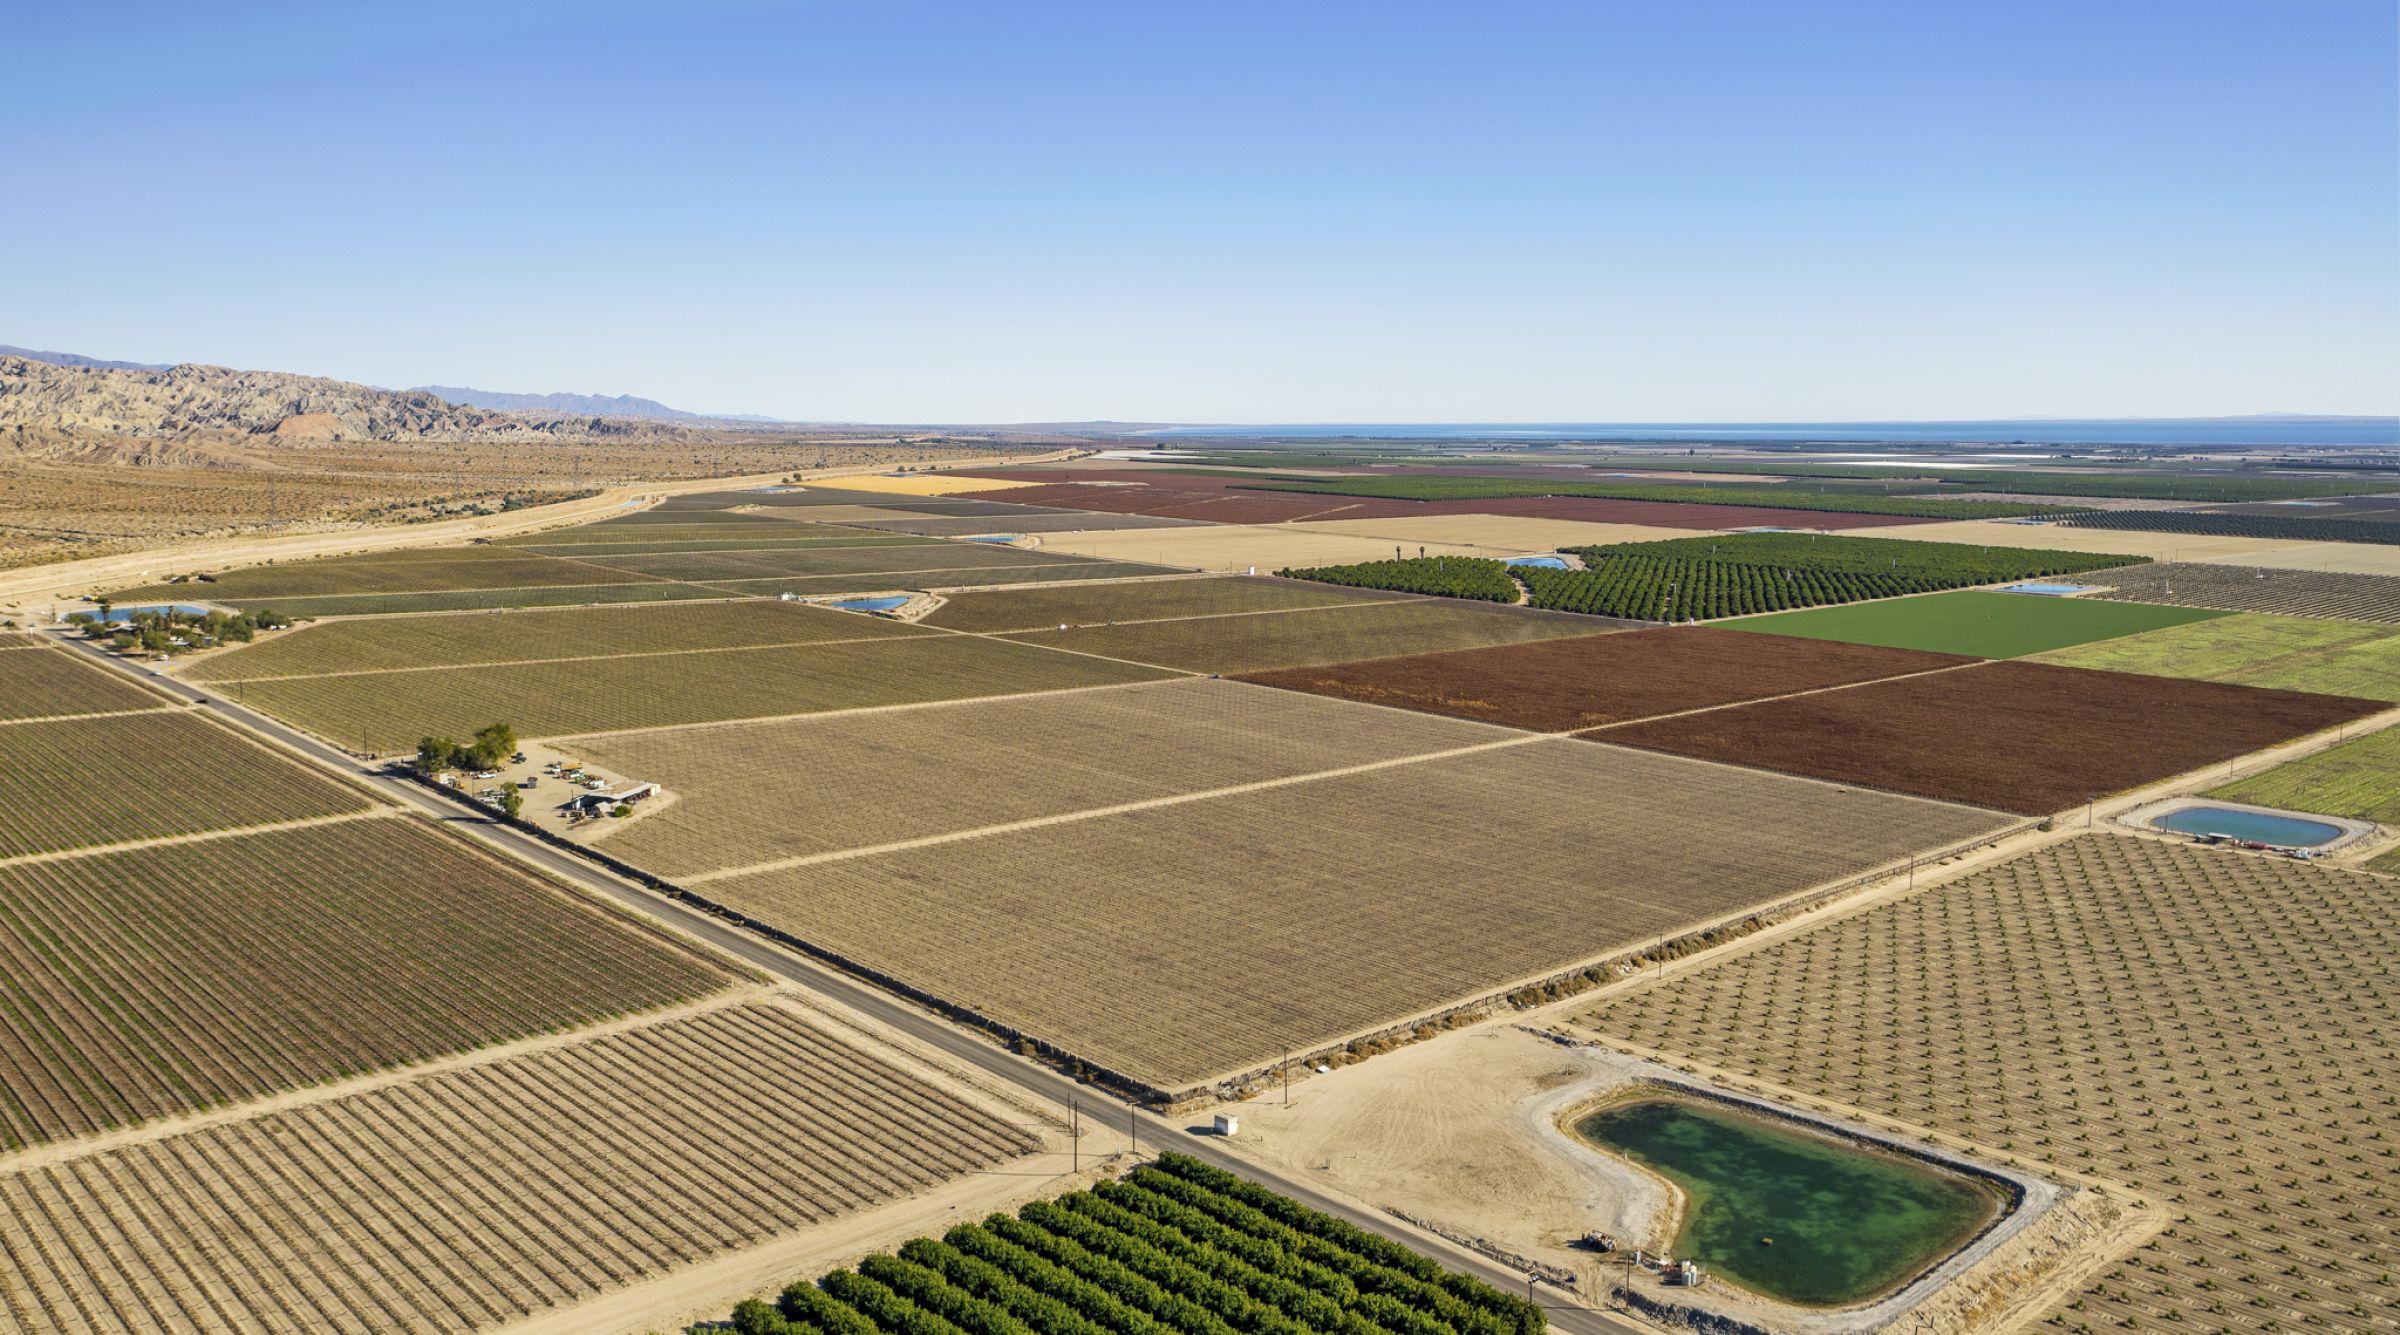 land-riverside-county-california-156-acres-listing-number-15579-0-2021-06-10-215743.jpg